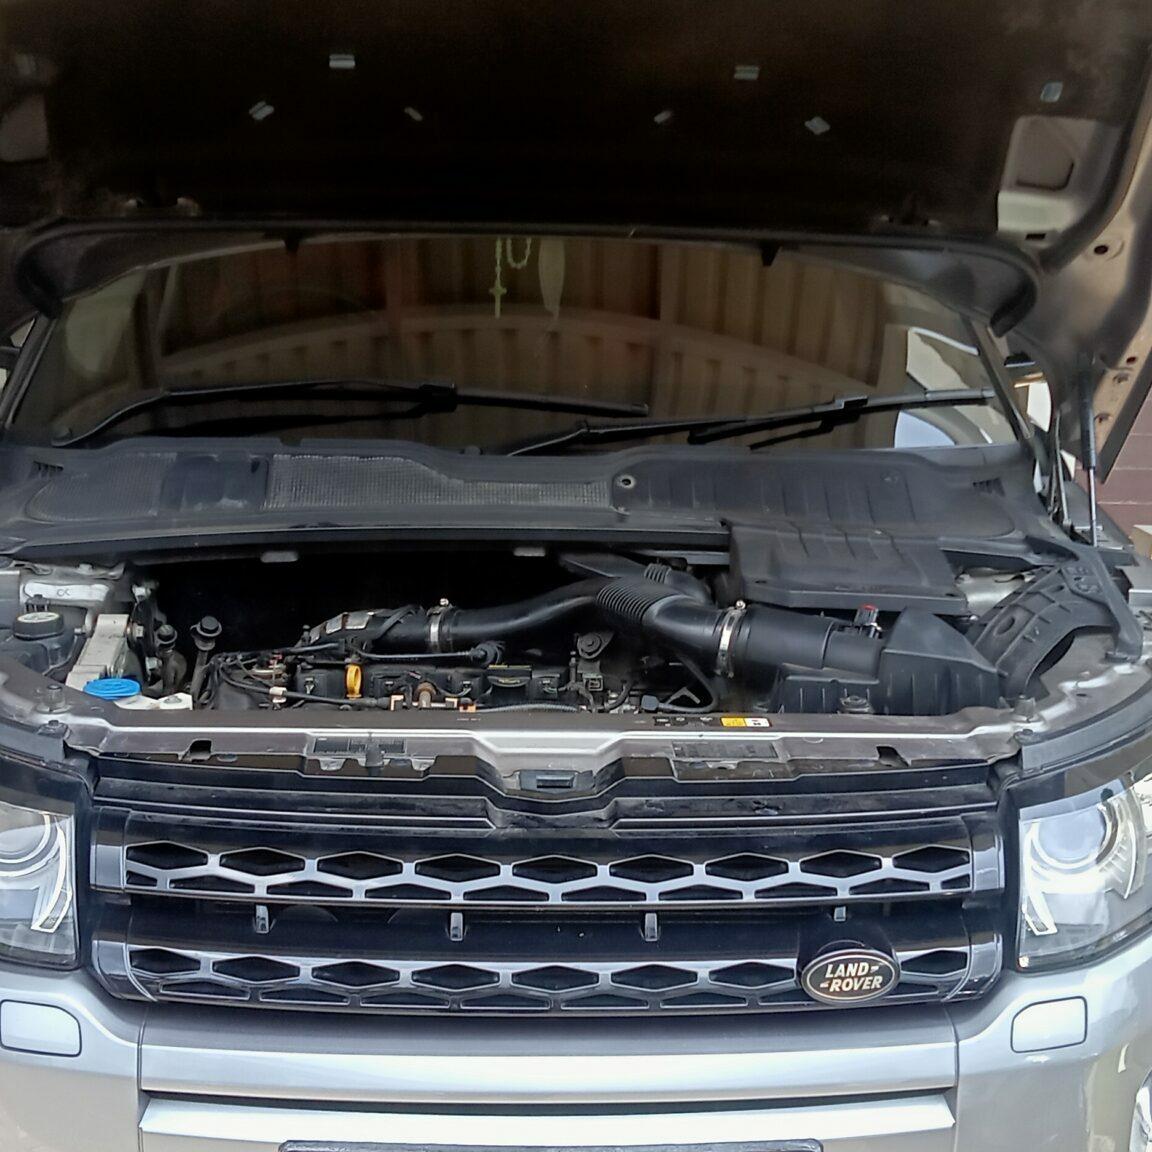 Service Range Rover Evoque Mobil Tidak Bertenaga, Ac Kurang Dingin